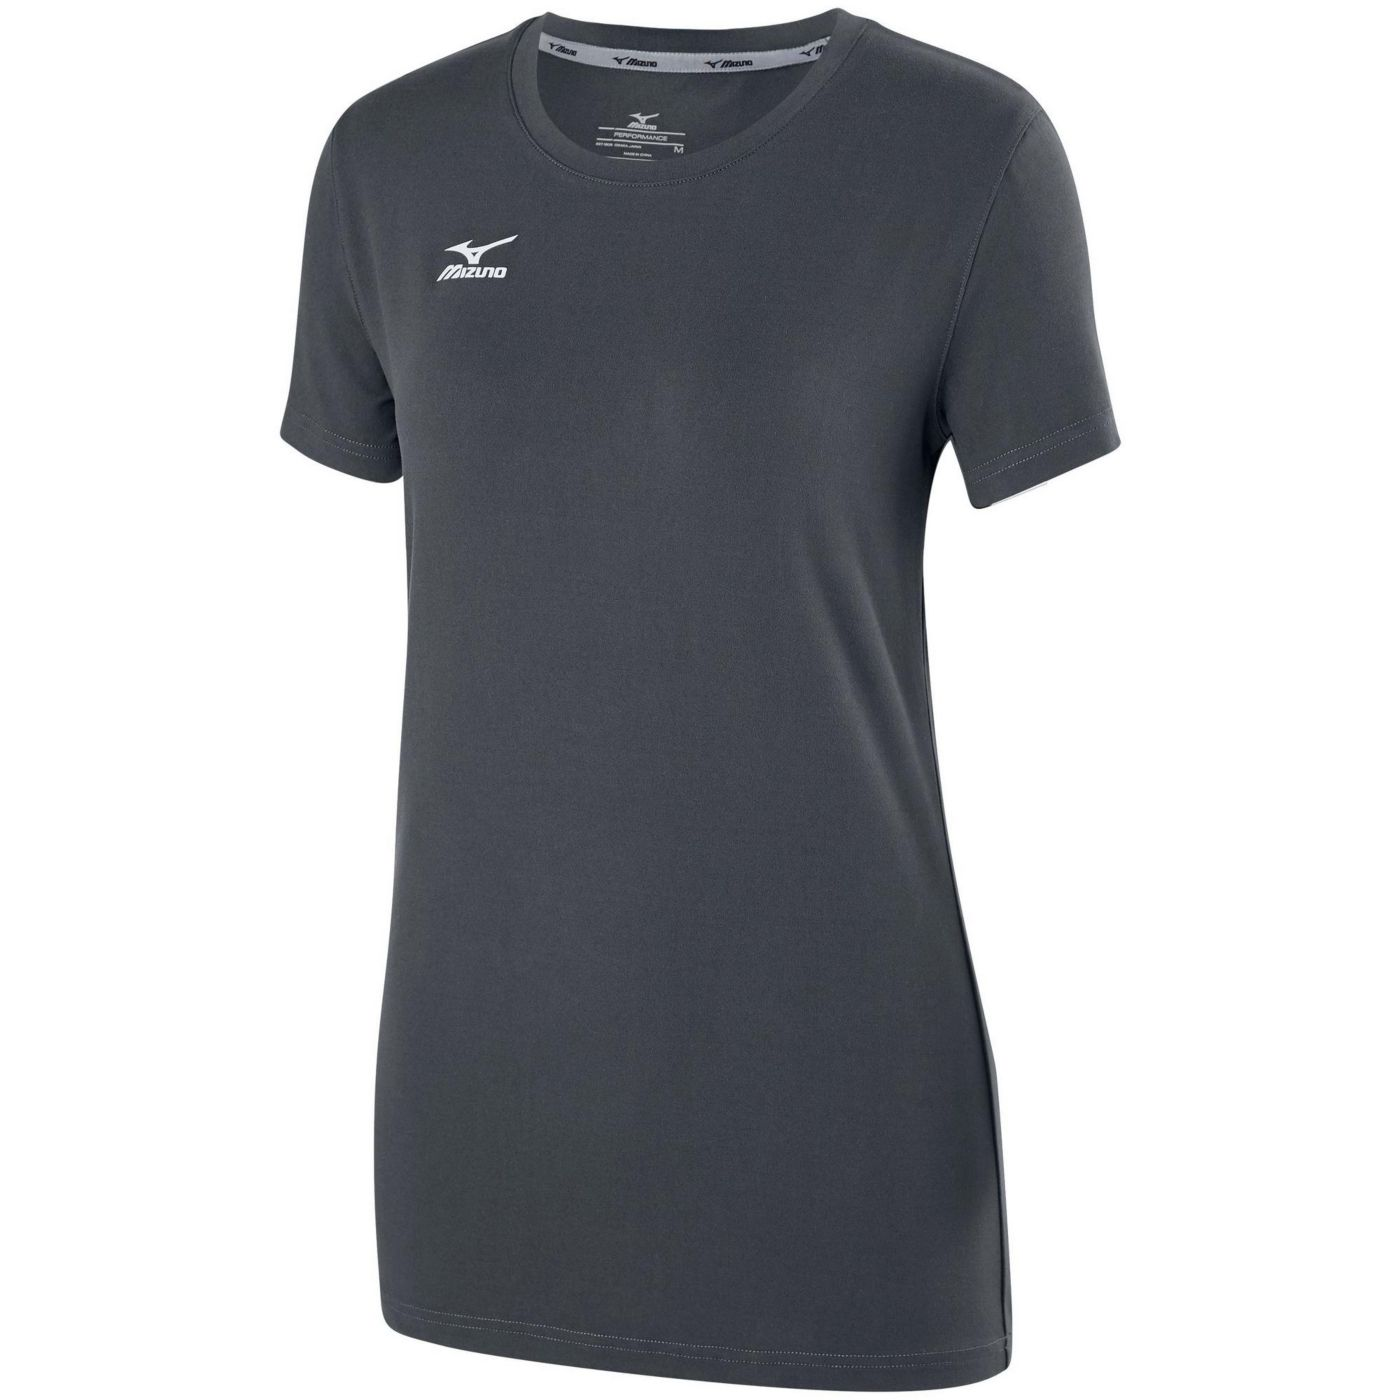 Mizuno Women's Volleyball Attack T-Shirt 2.0